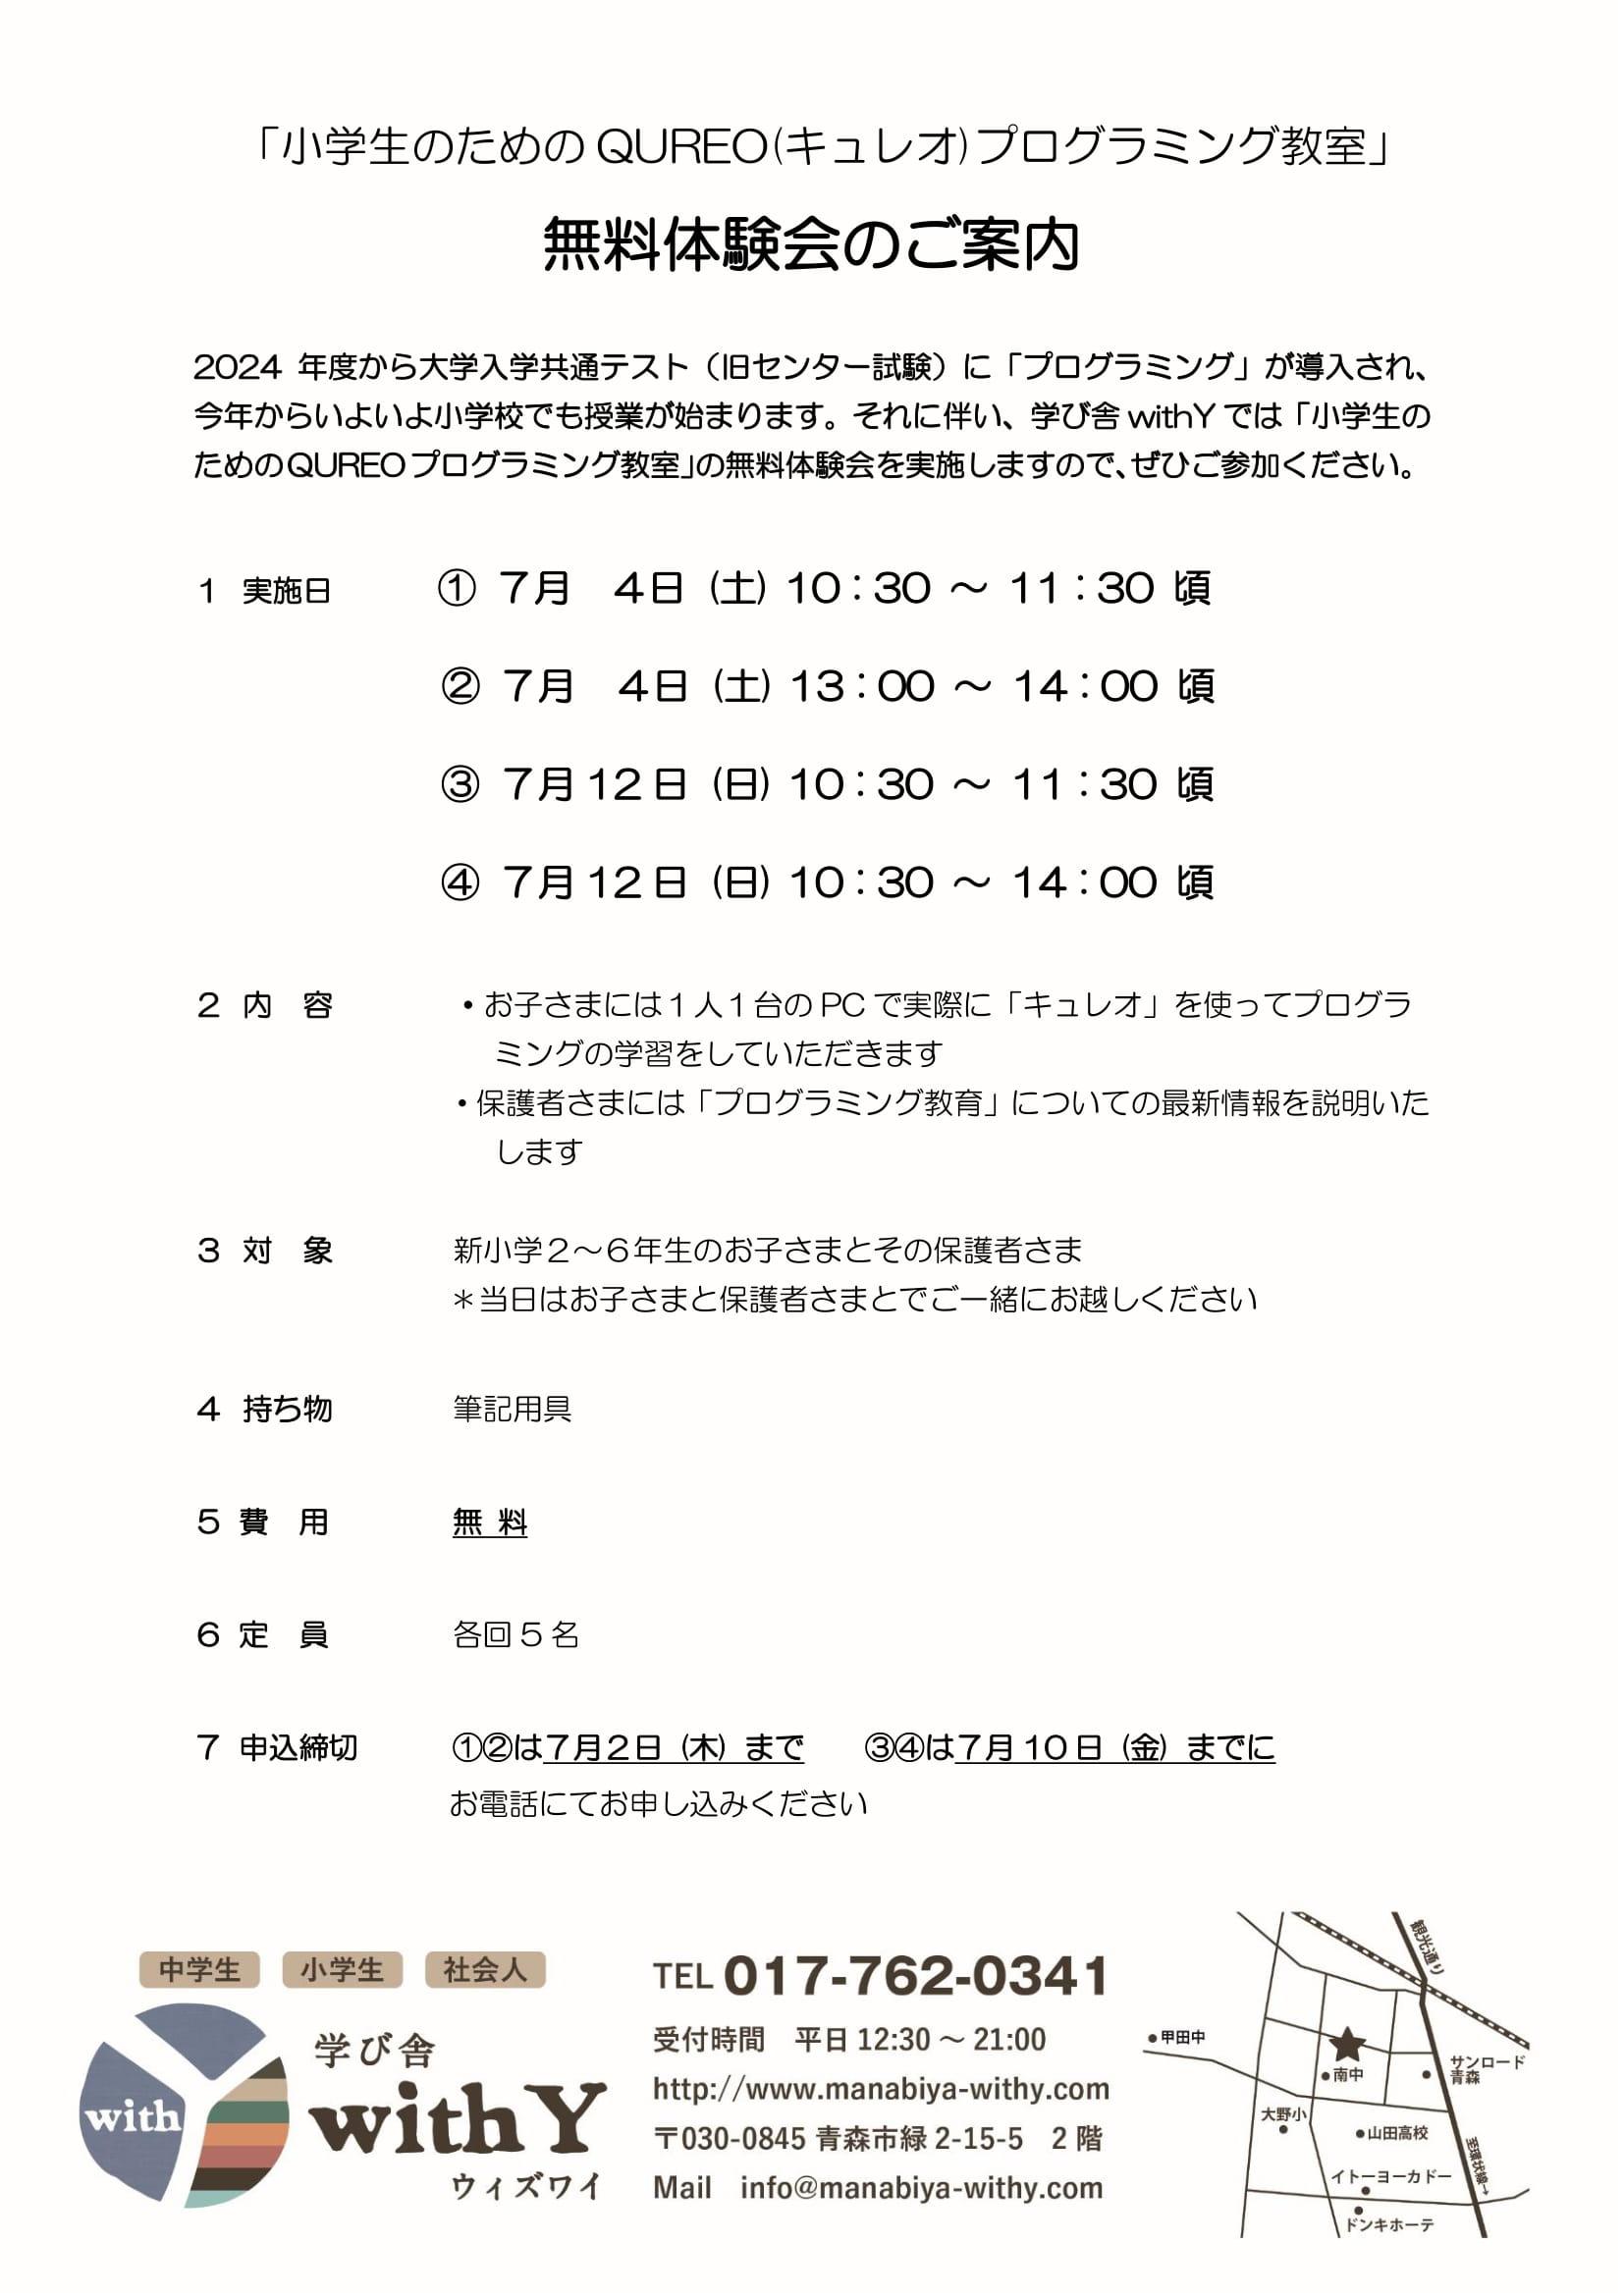 夏の体験会案内.jpg